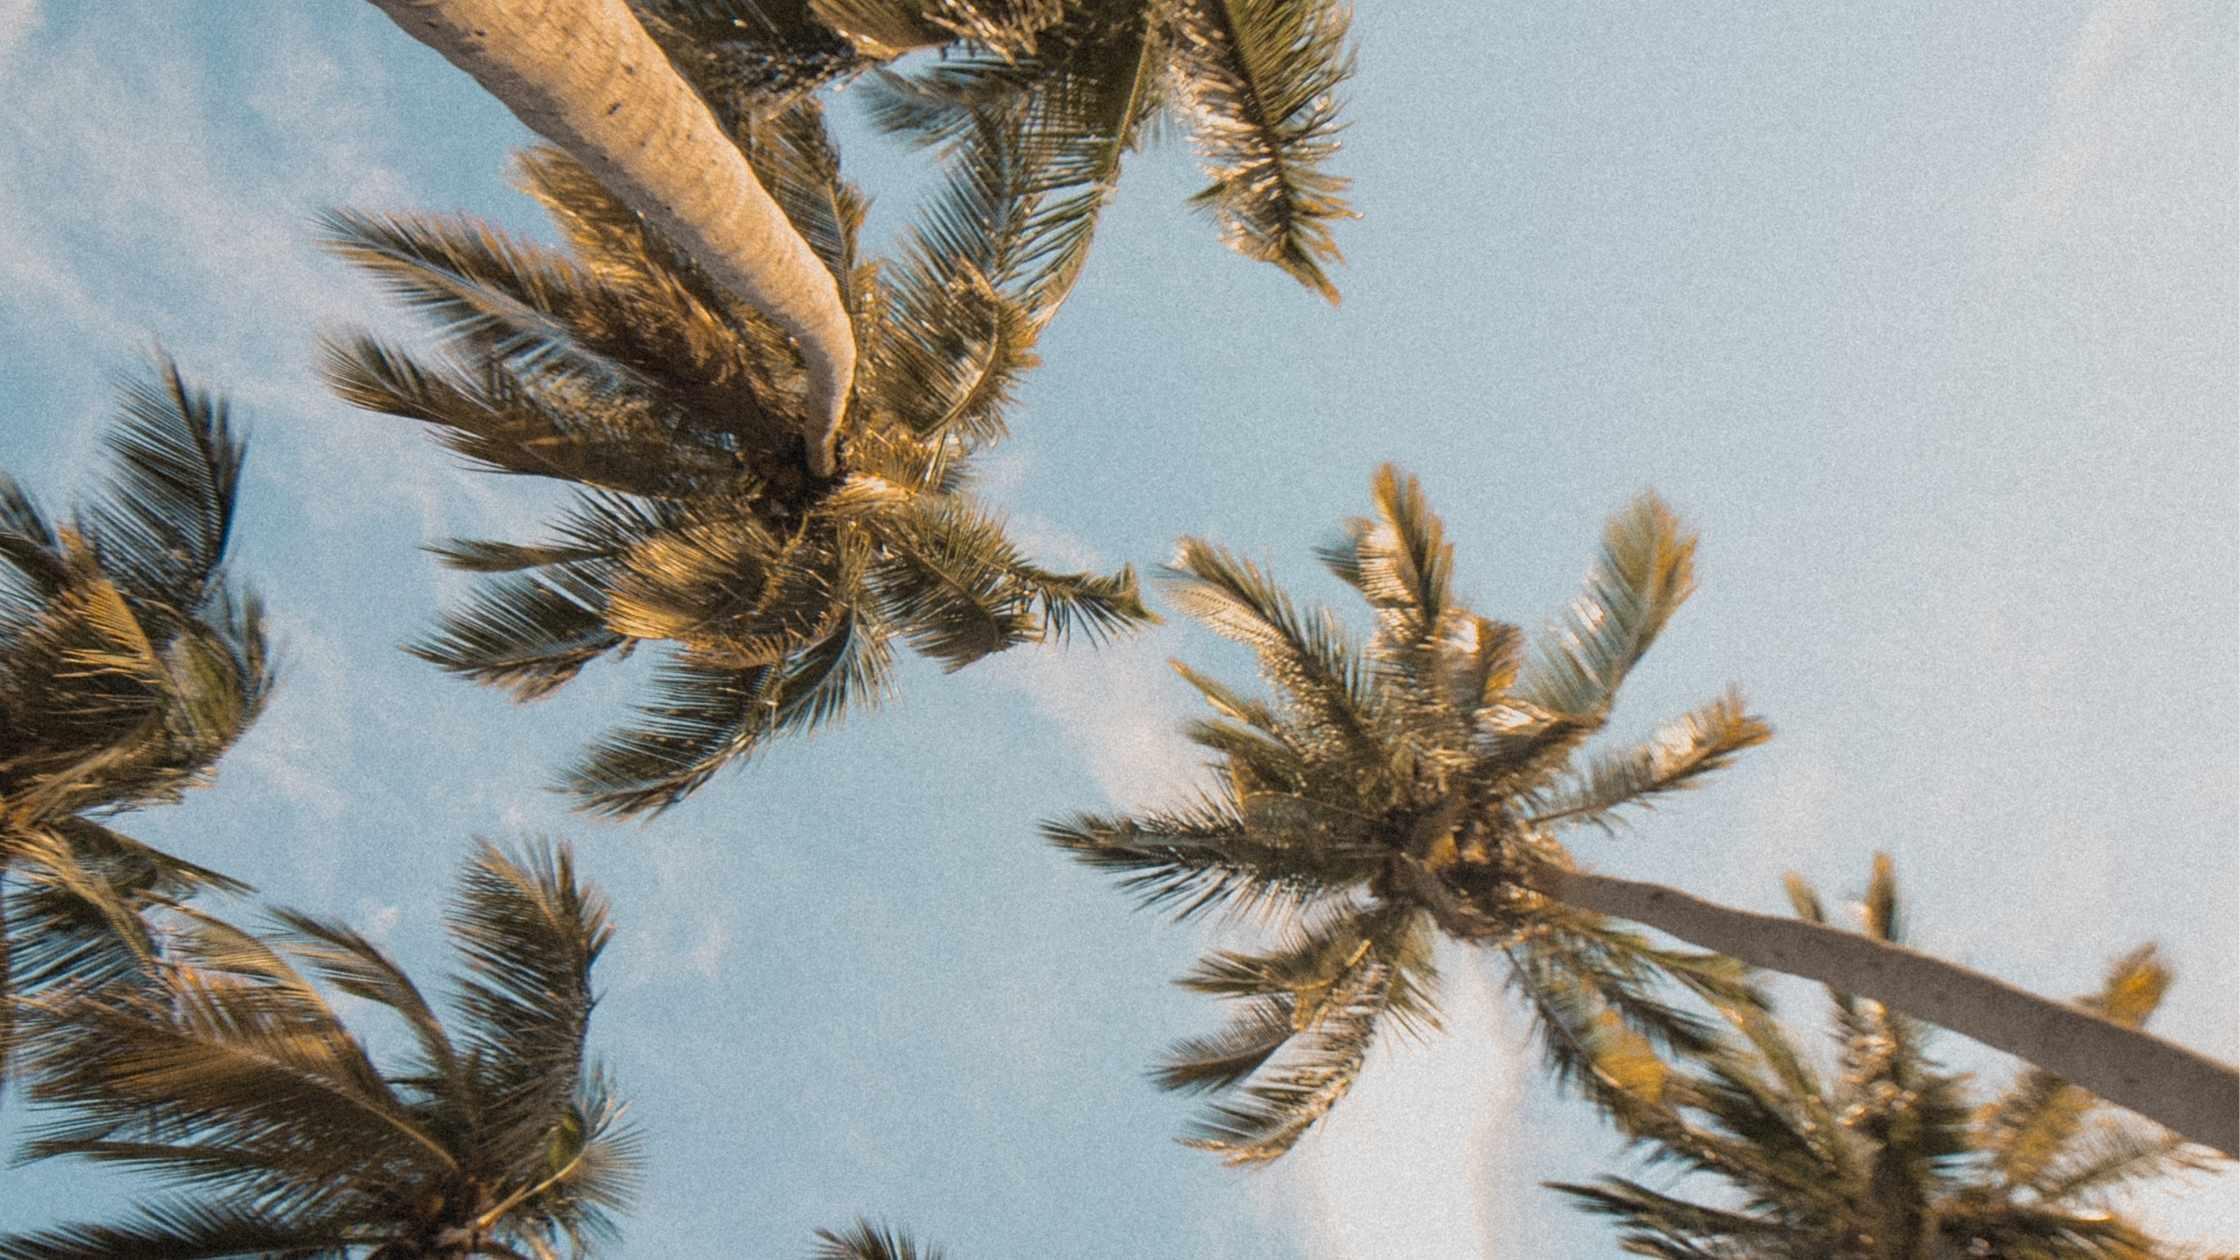 12 Summer Wardrobe Essentials + Where to Buy Them